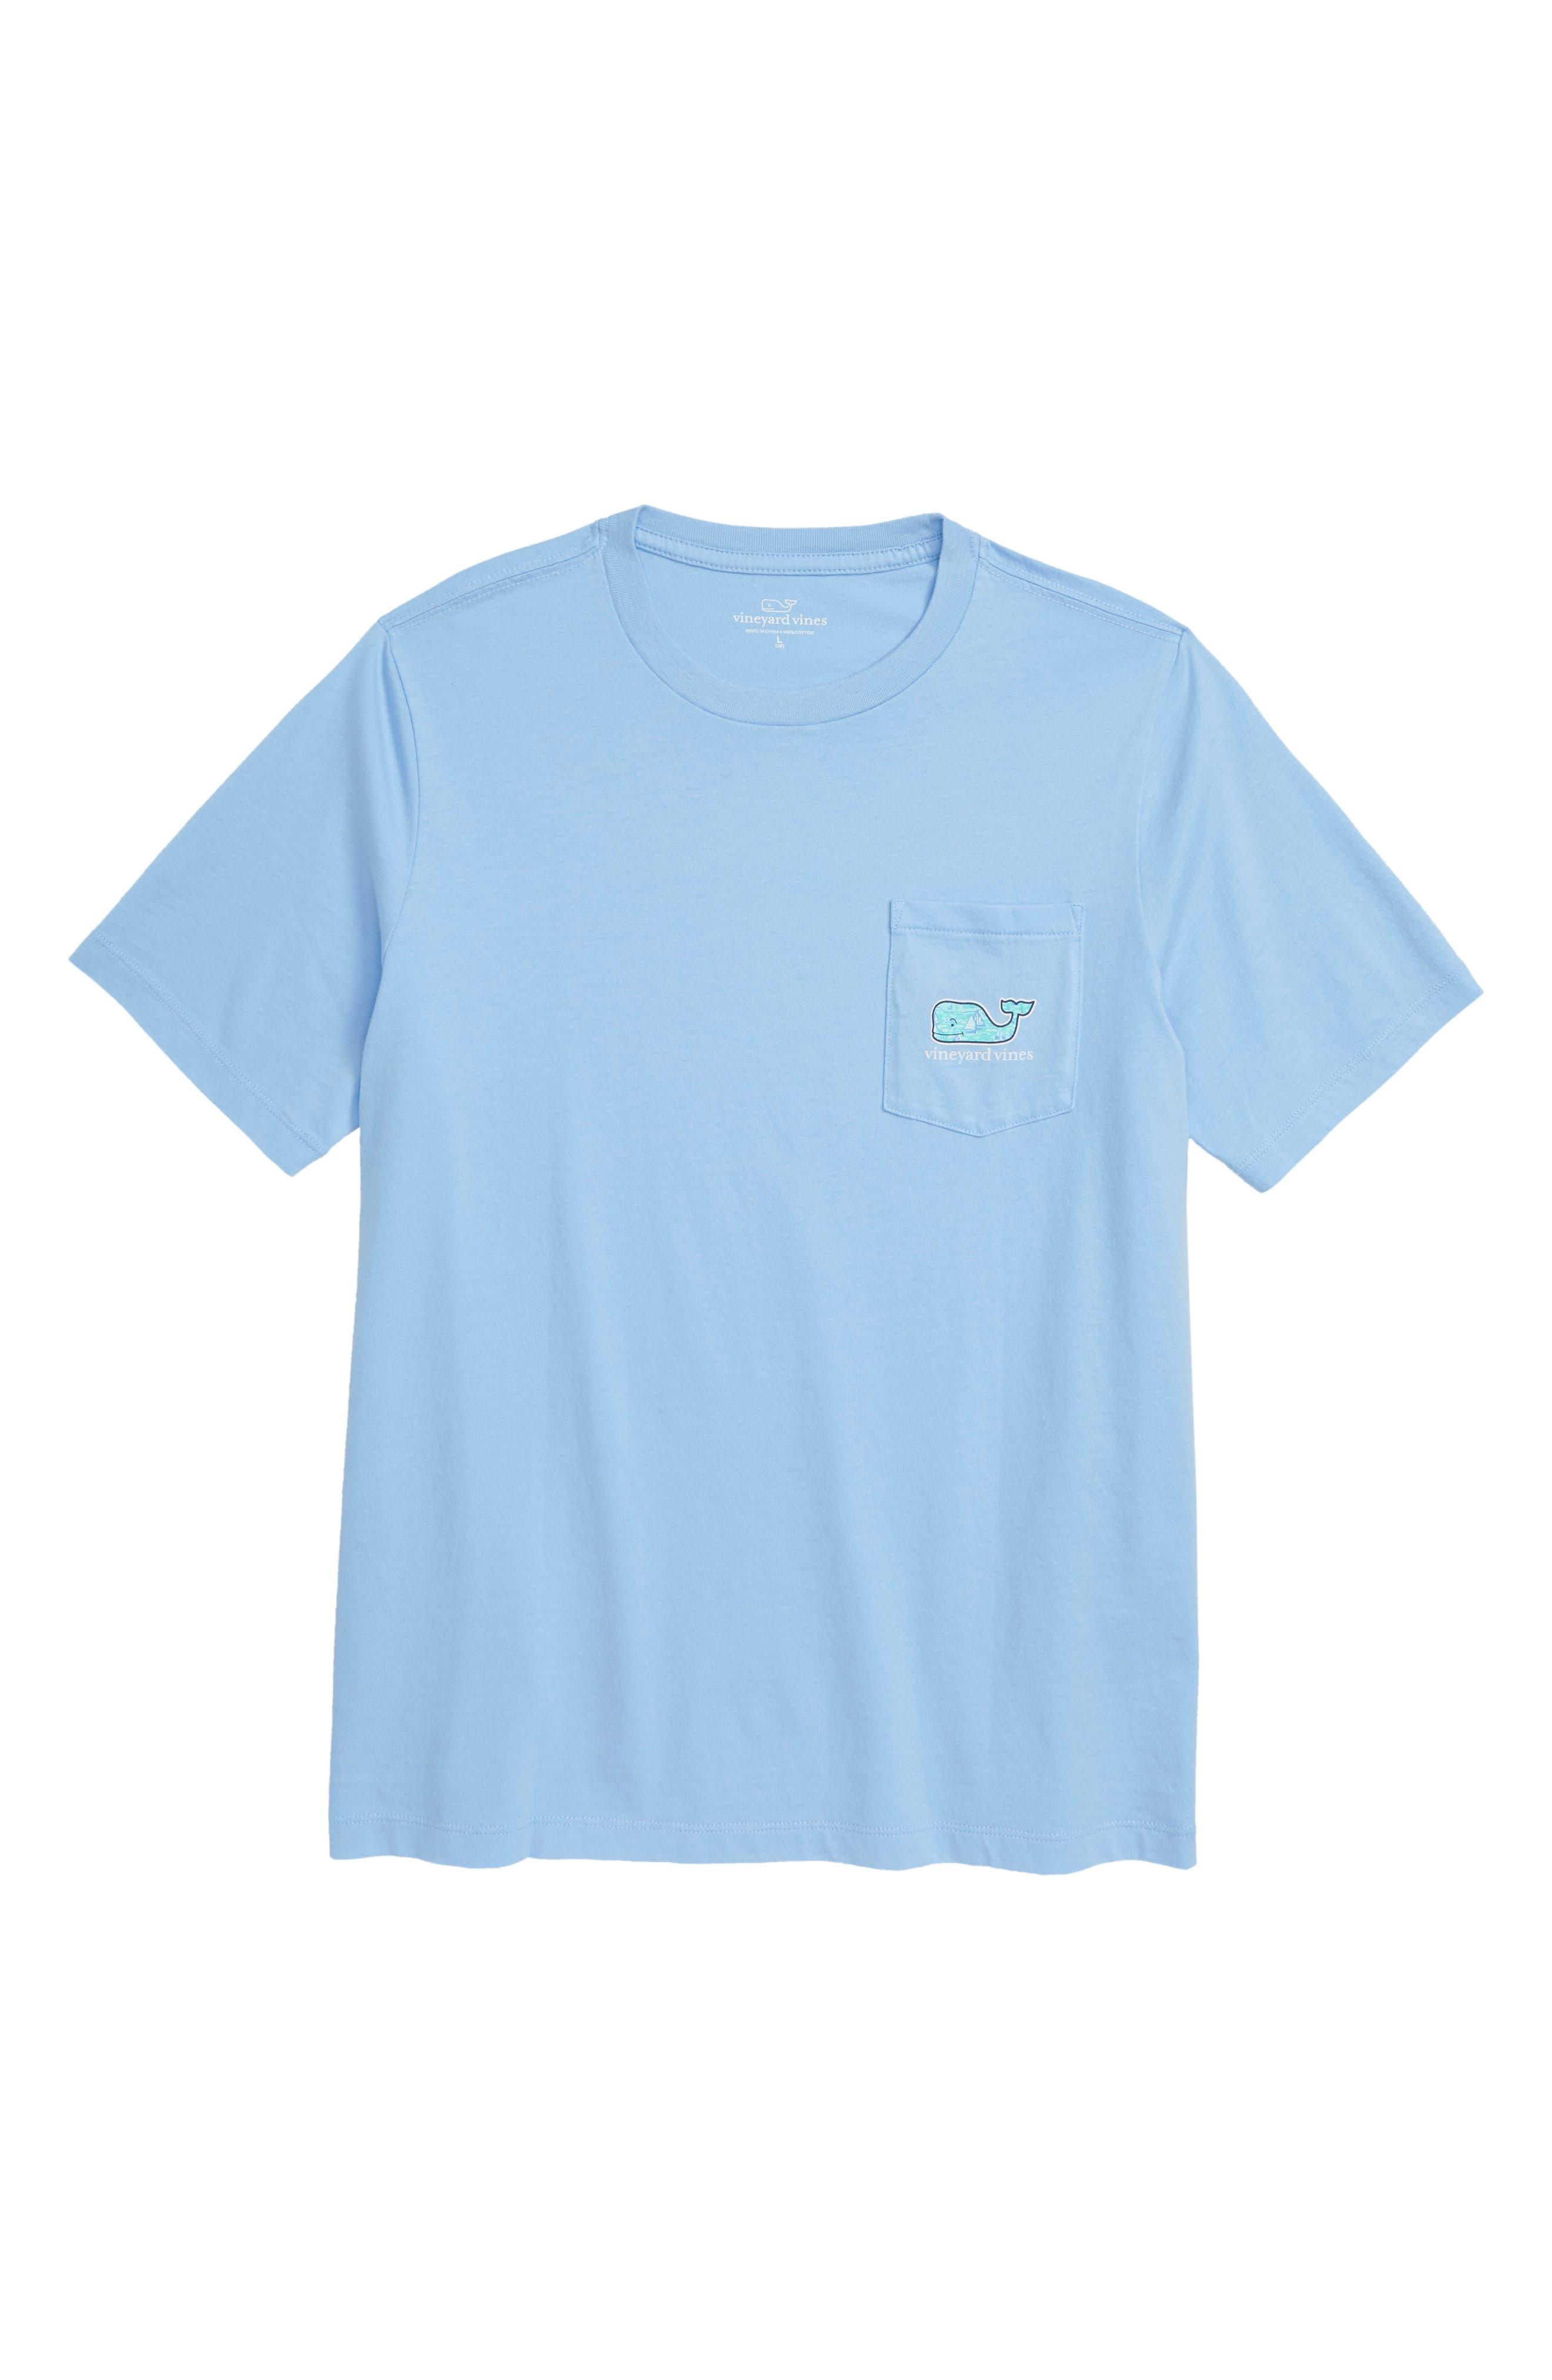 Sailing the Vineyard Whale Pocket T-Shirt,                             Main thumbnail 1, color,                             456